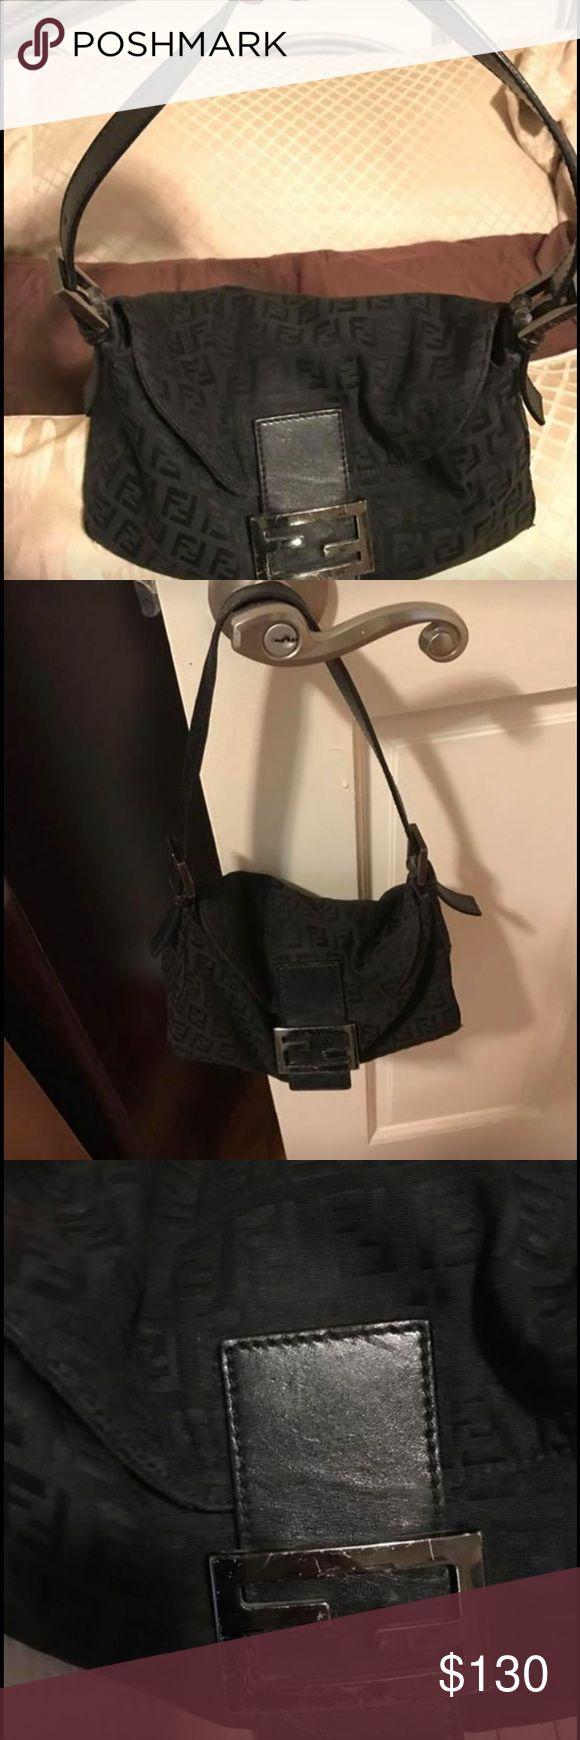 Genuine fendi purse Authentic Black fendi purse AUTHENTIC.  Has some wear as shown in photo. Comes with original dust bag. Fendi Bags Shoulder Bags